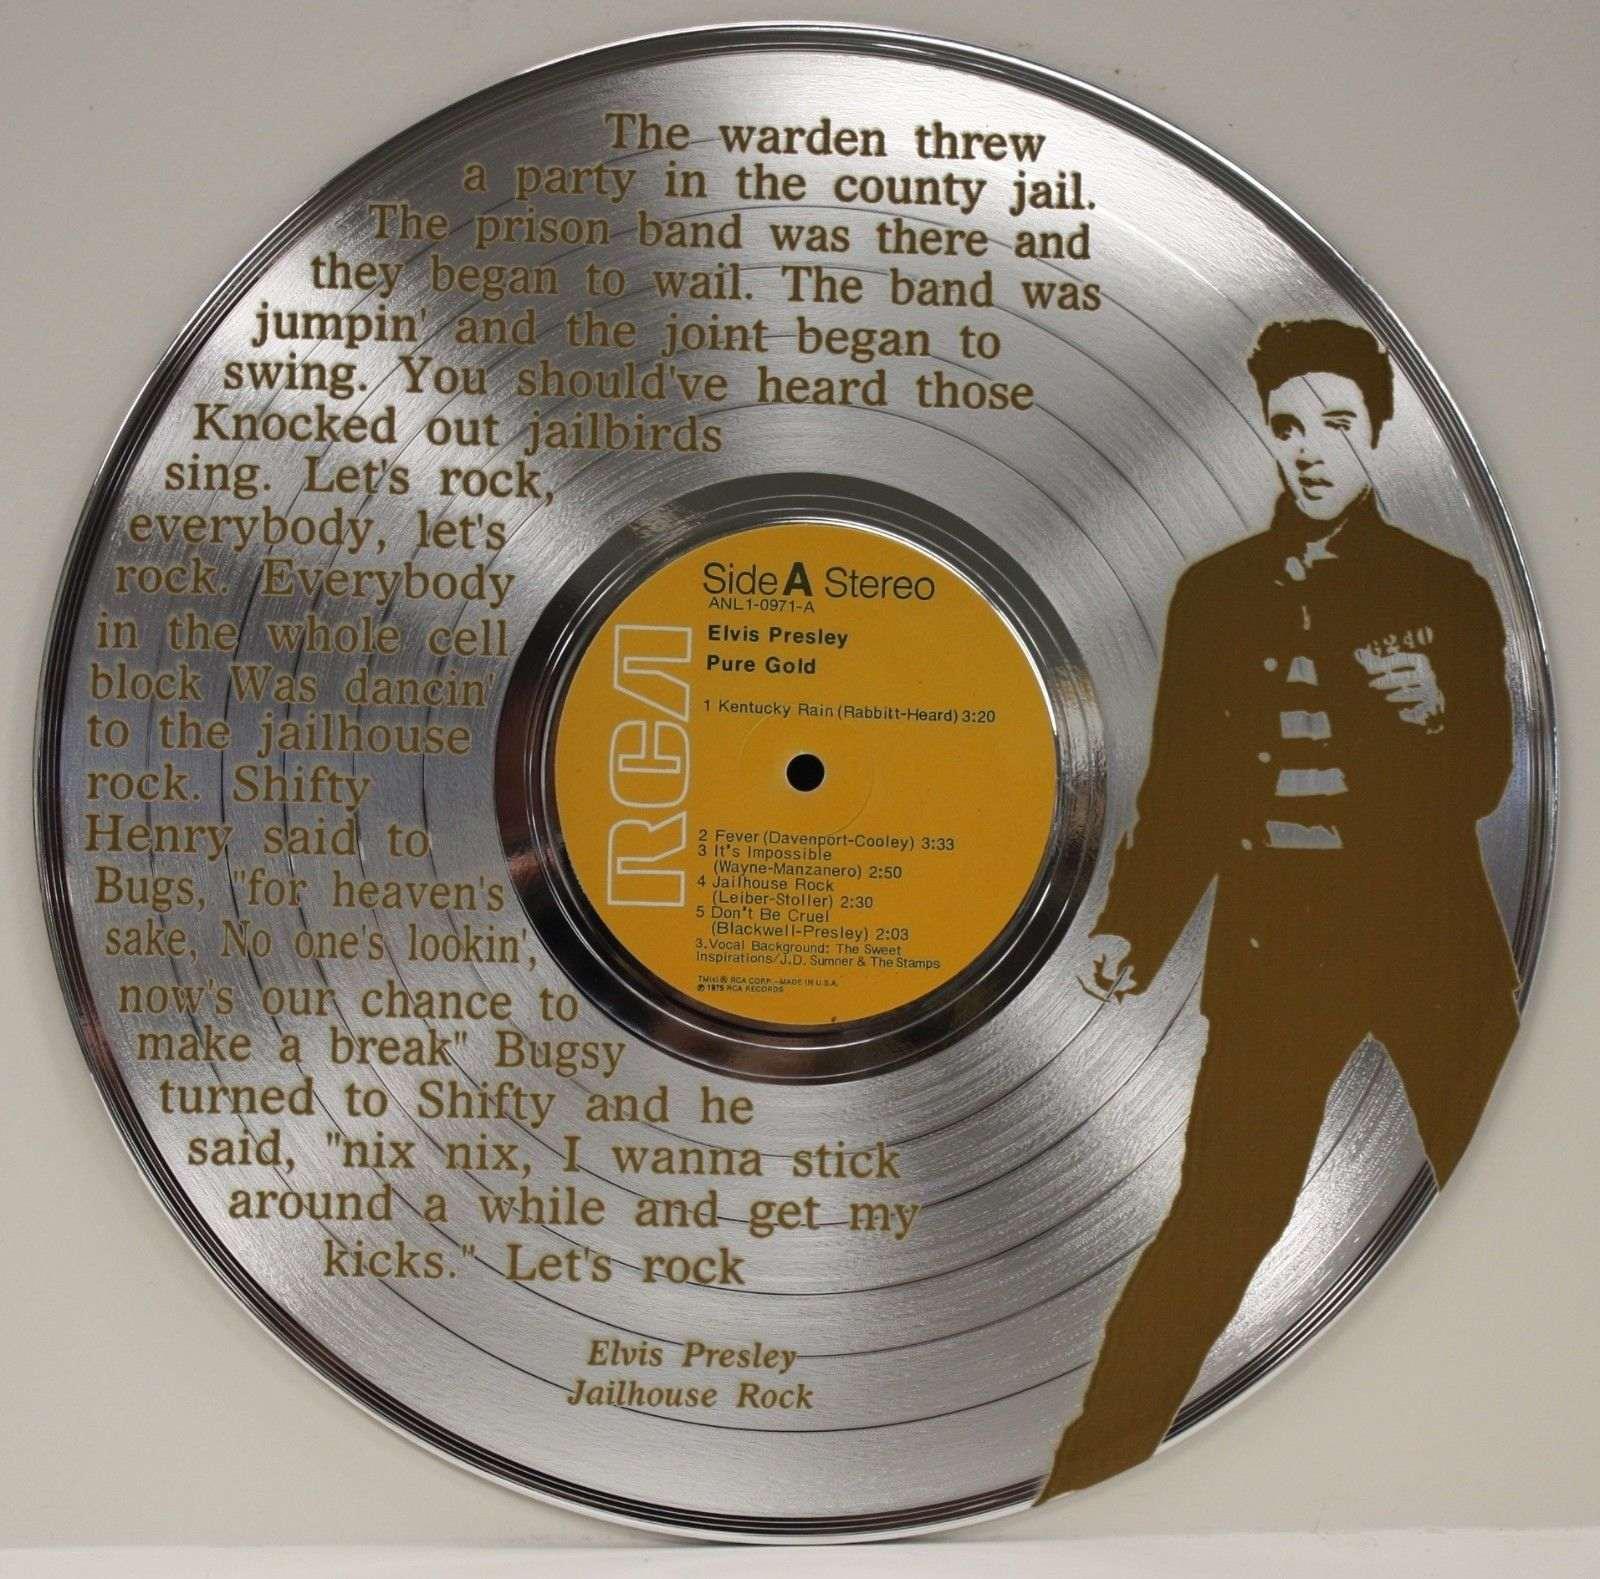 Elvis Presley Silver Laser Etched Ltd Edition Lp Record